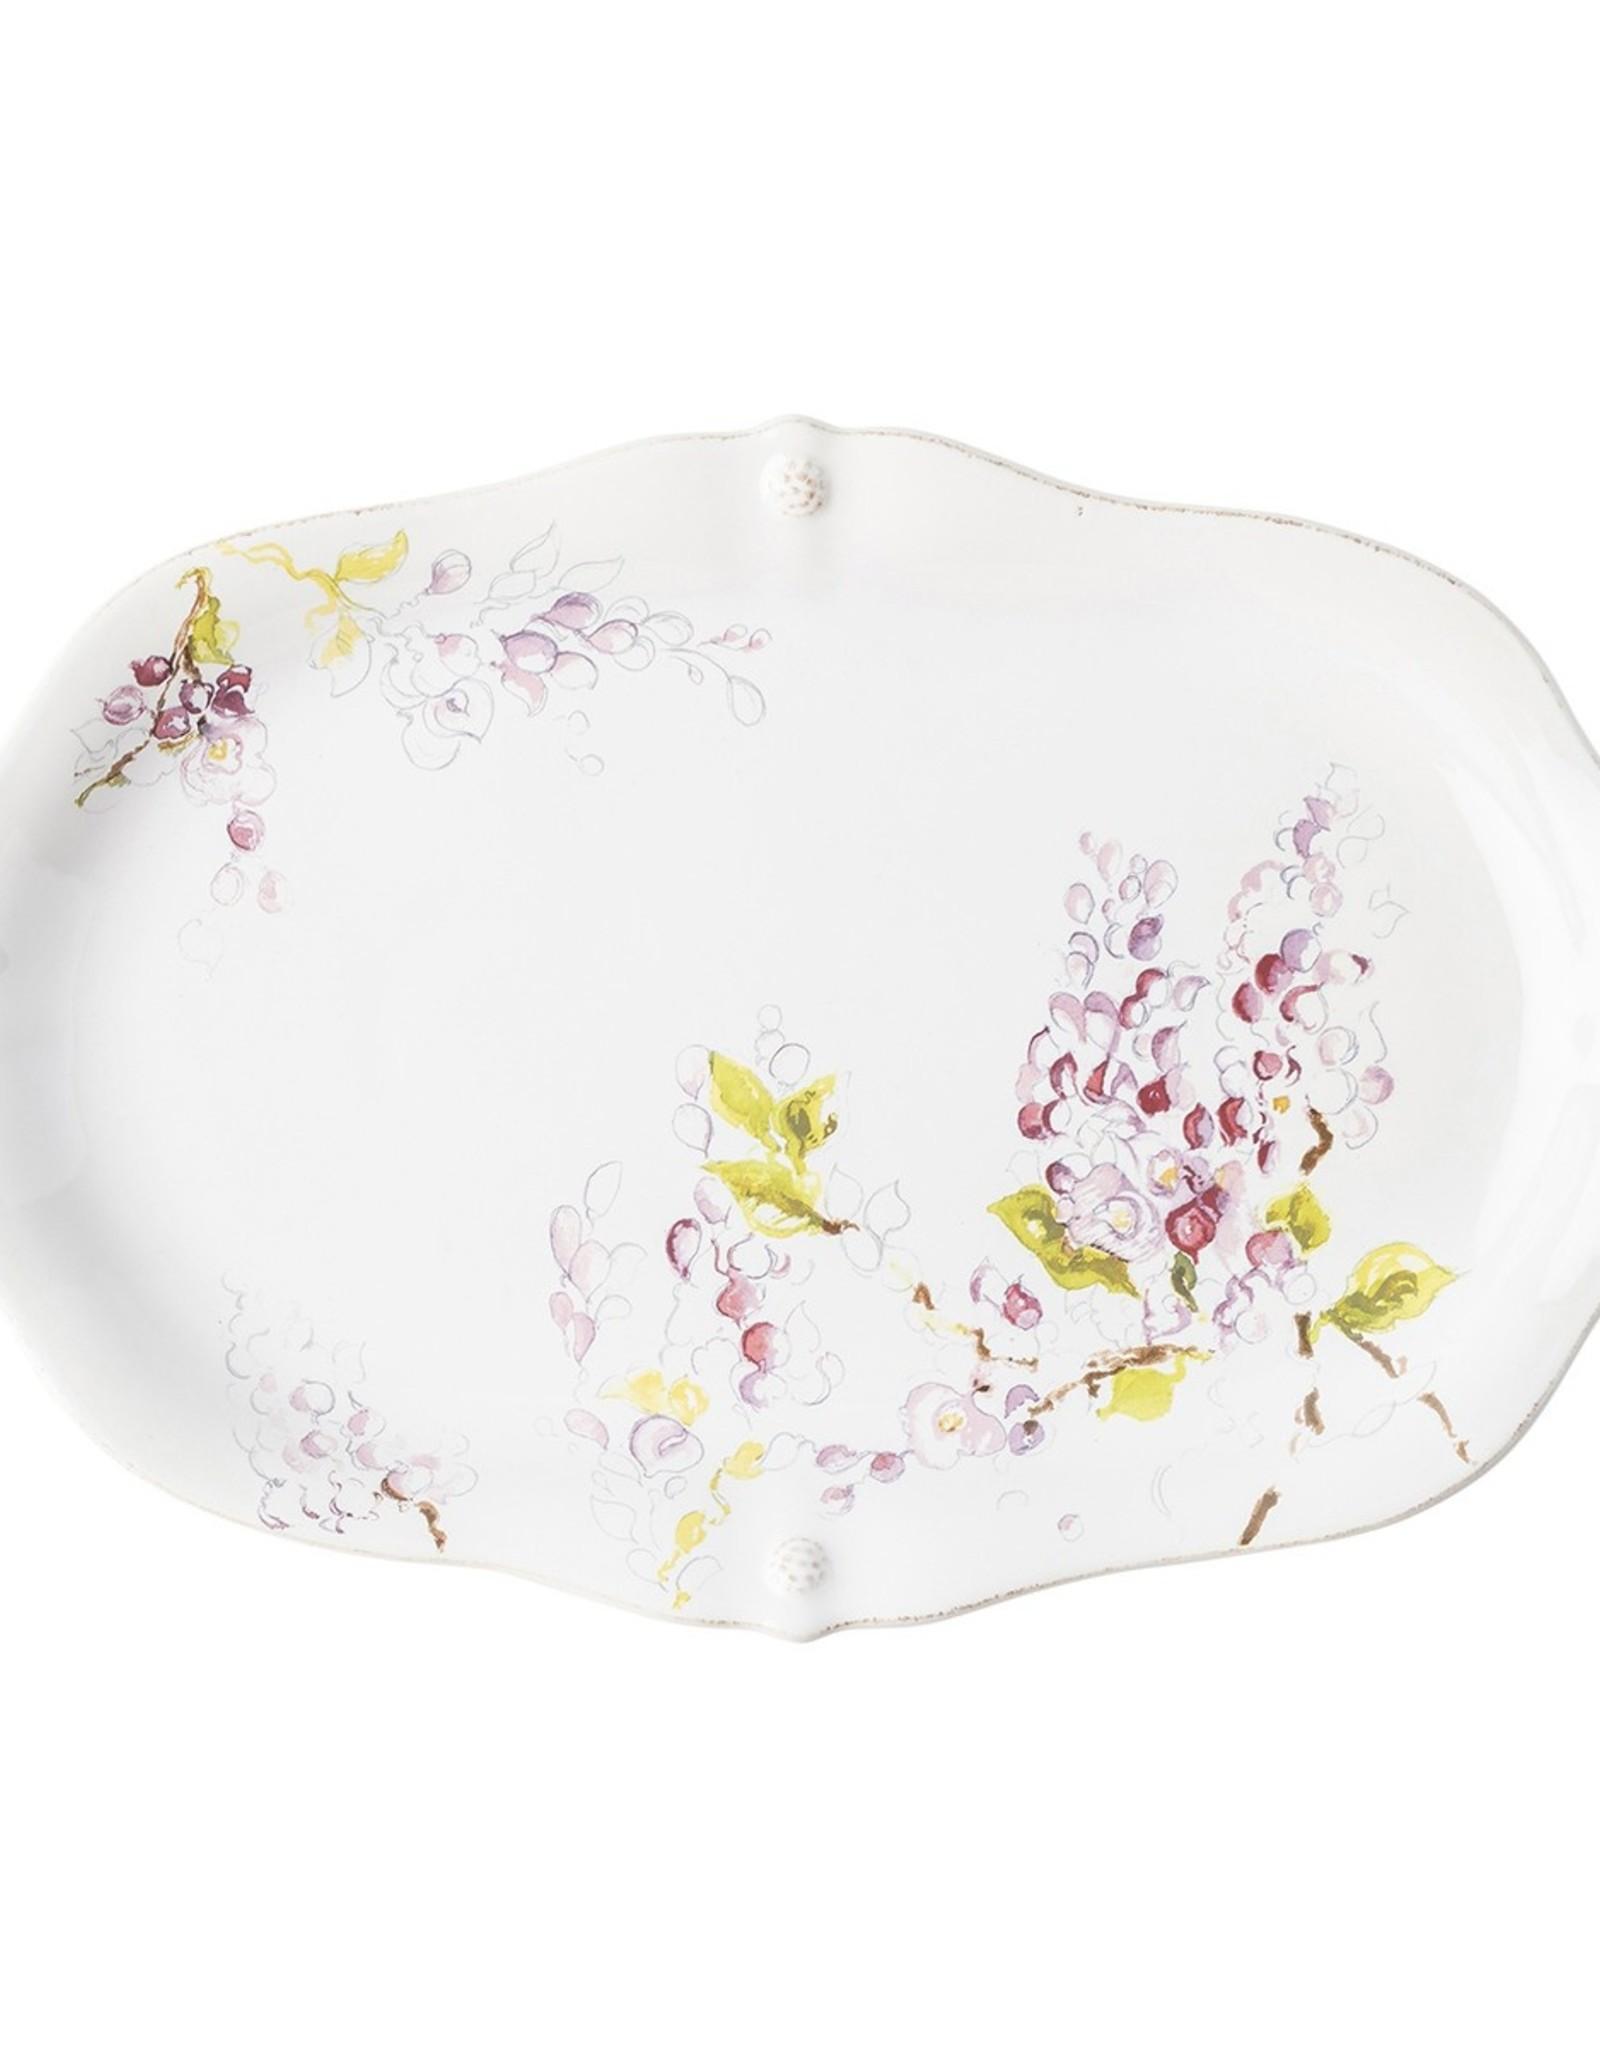 "Juliska B&T Floral Sketch Wisteria Platter 16"""